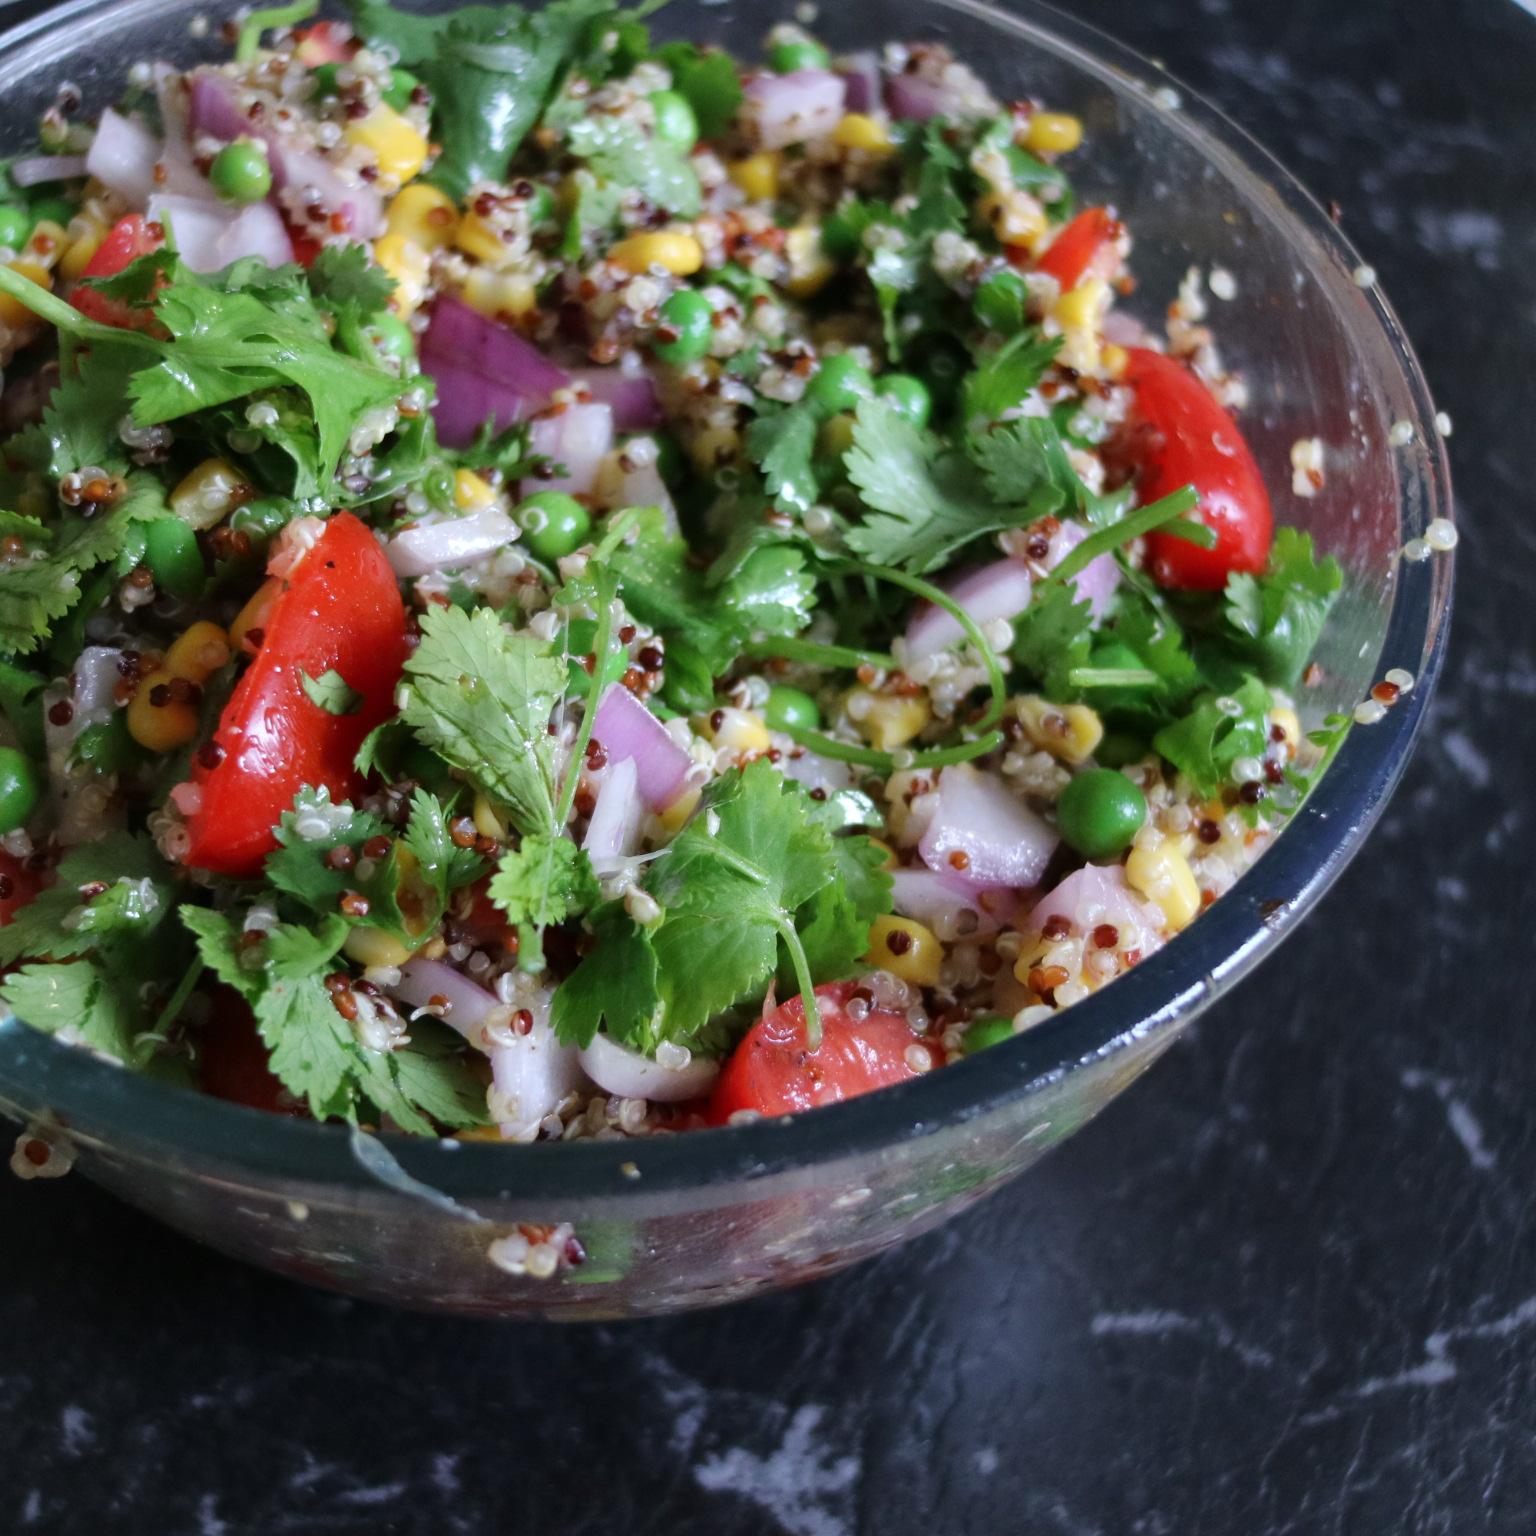 Meal-Prep_Chicken-Mexican-Salad1.jpg